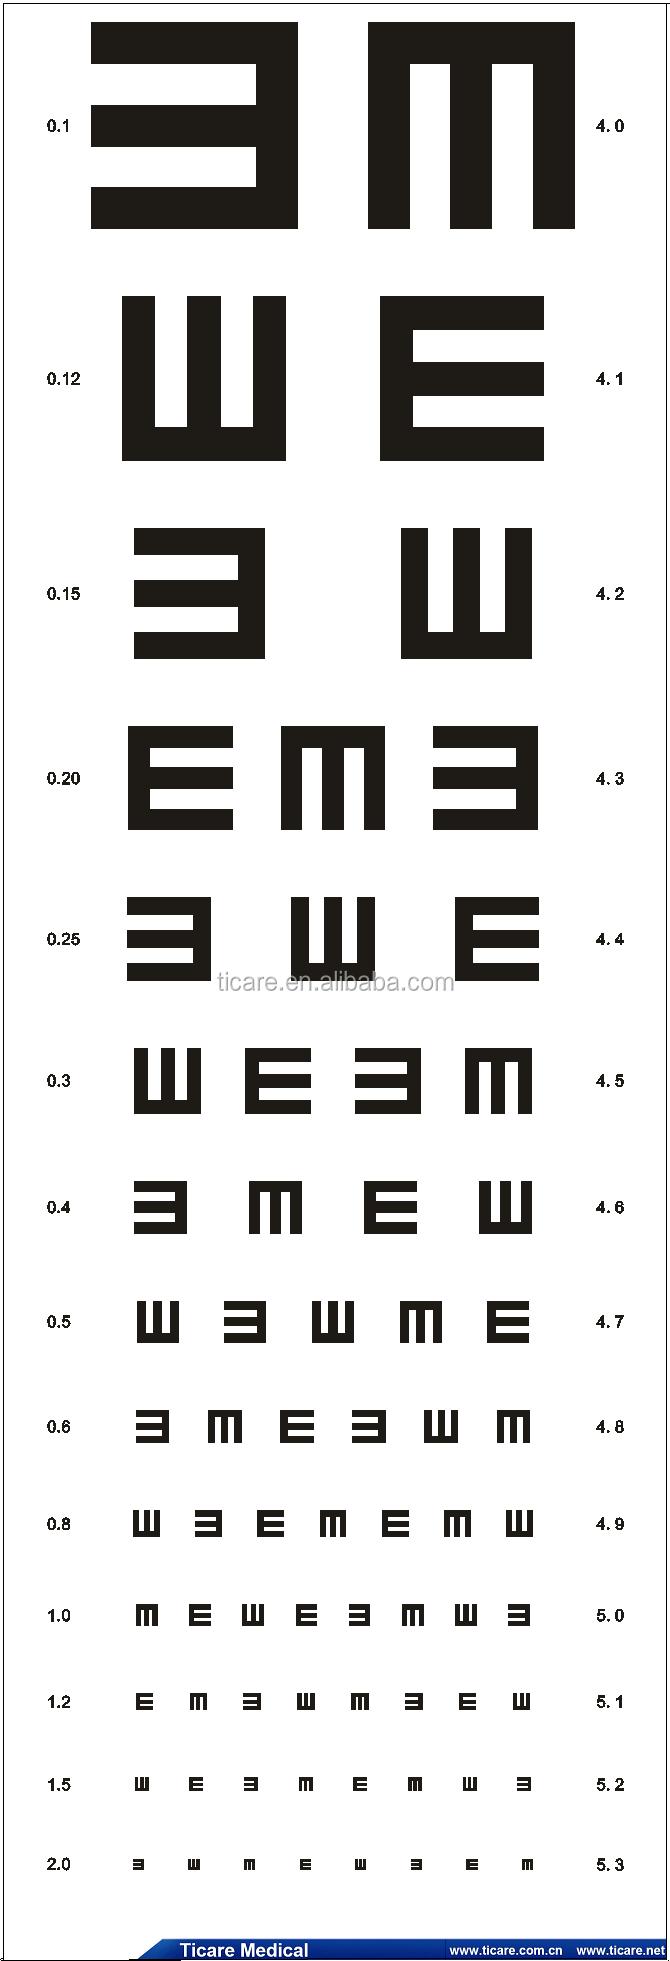 TC1233-2 Reusable PVC universal eye test chart-Ticarehealth